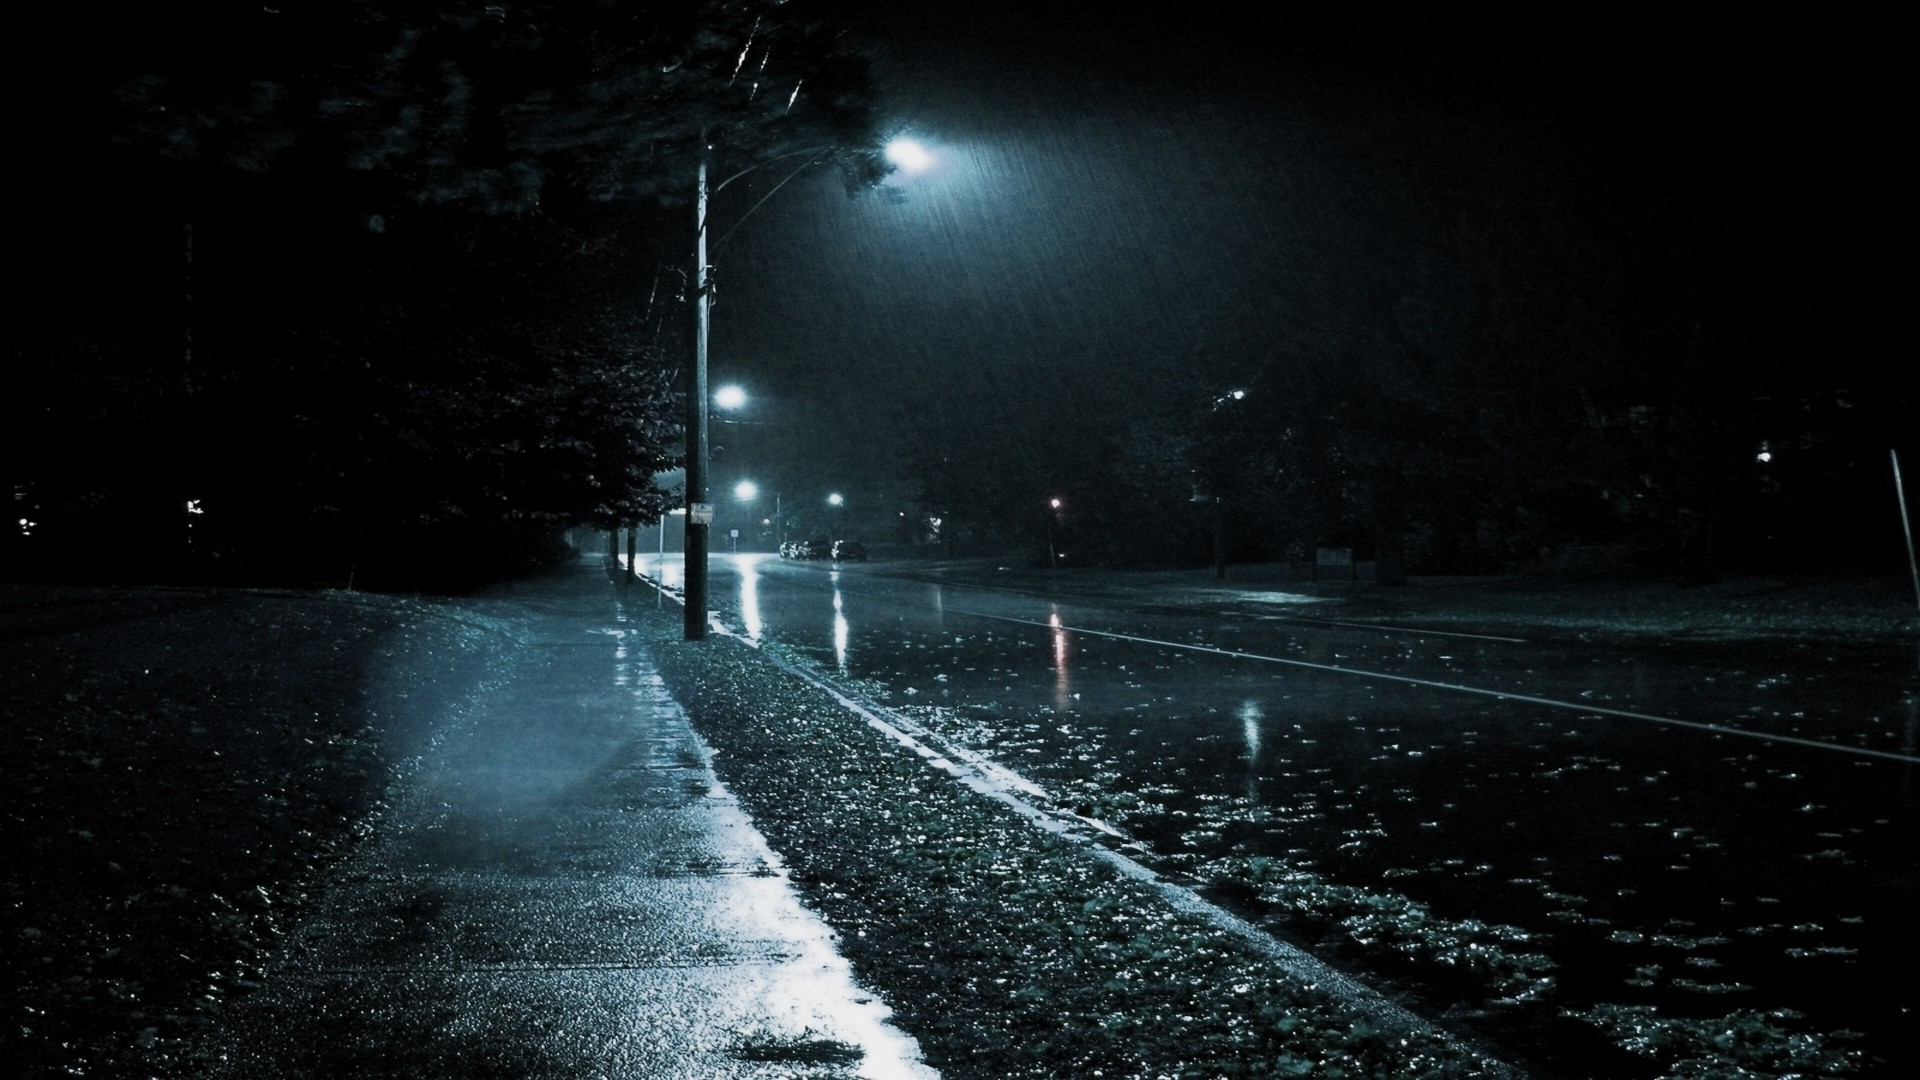 rain image download